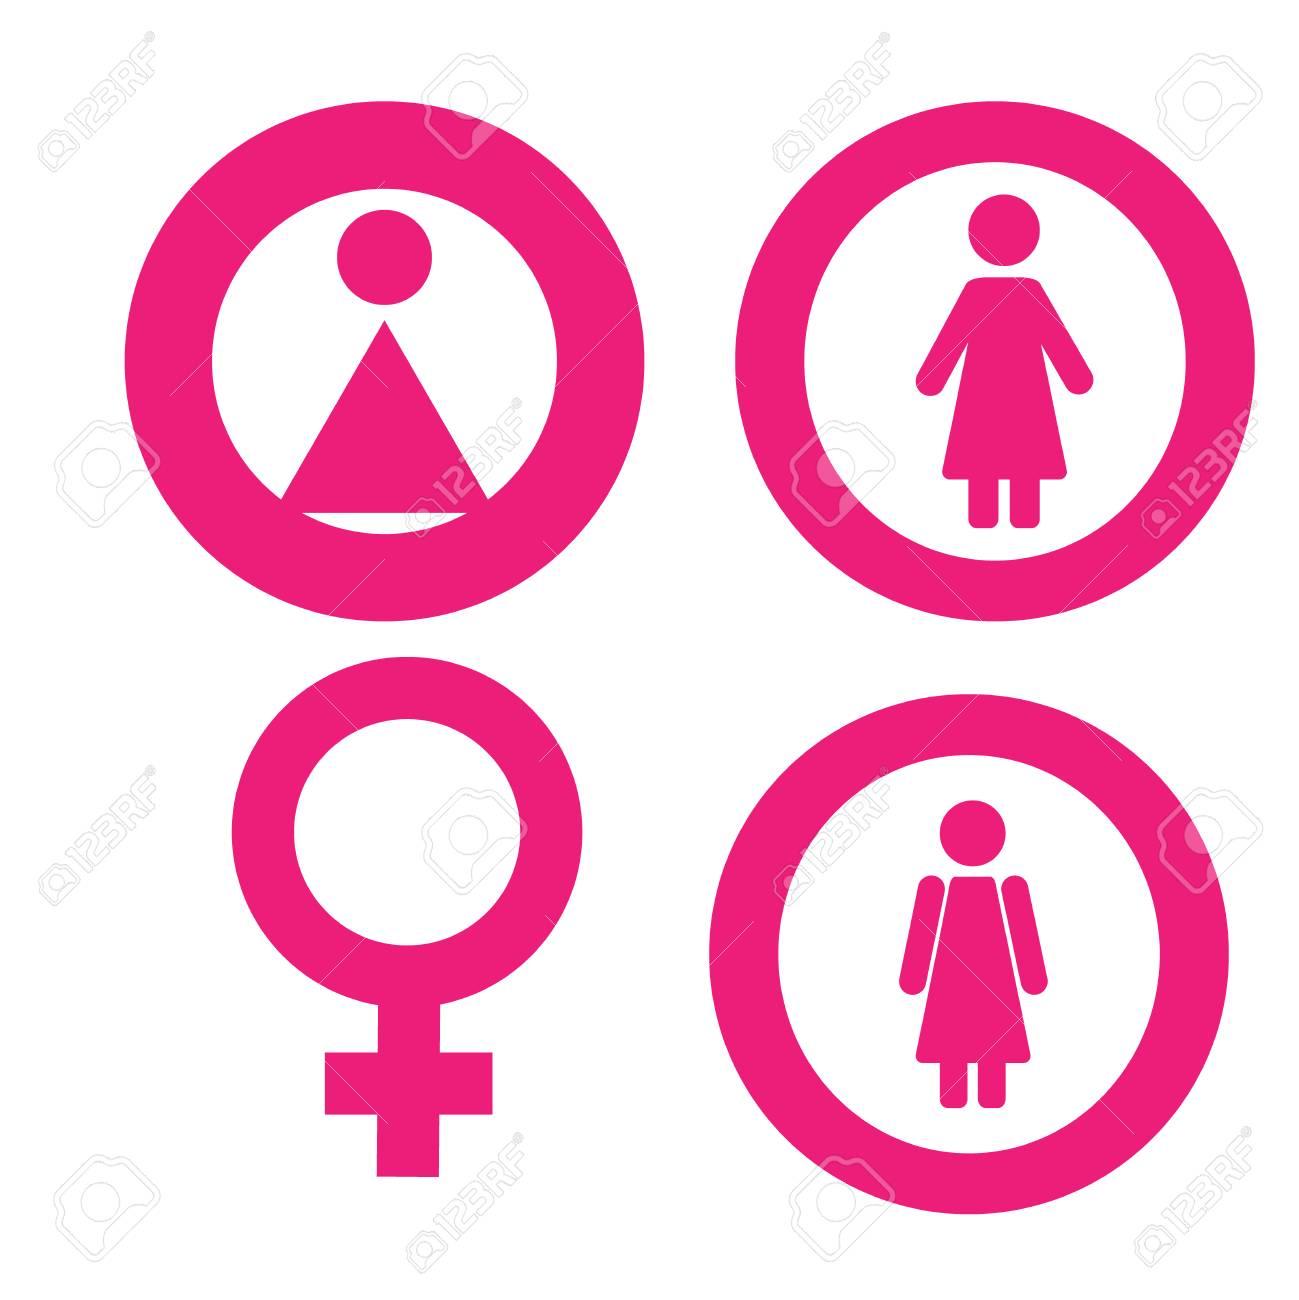 Gender Symbol Set Male Female Girl Boy Woman Man Icon Stock Photo